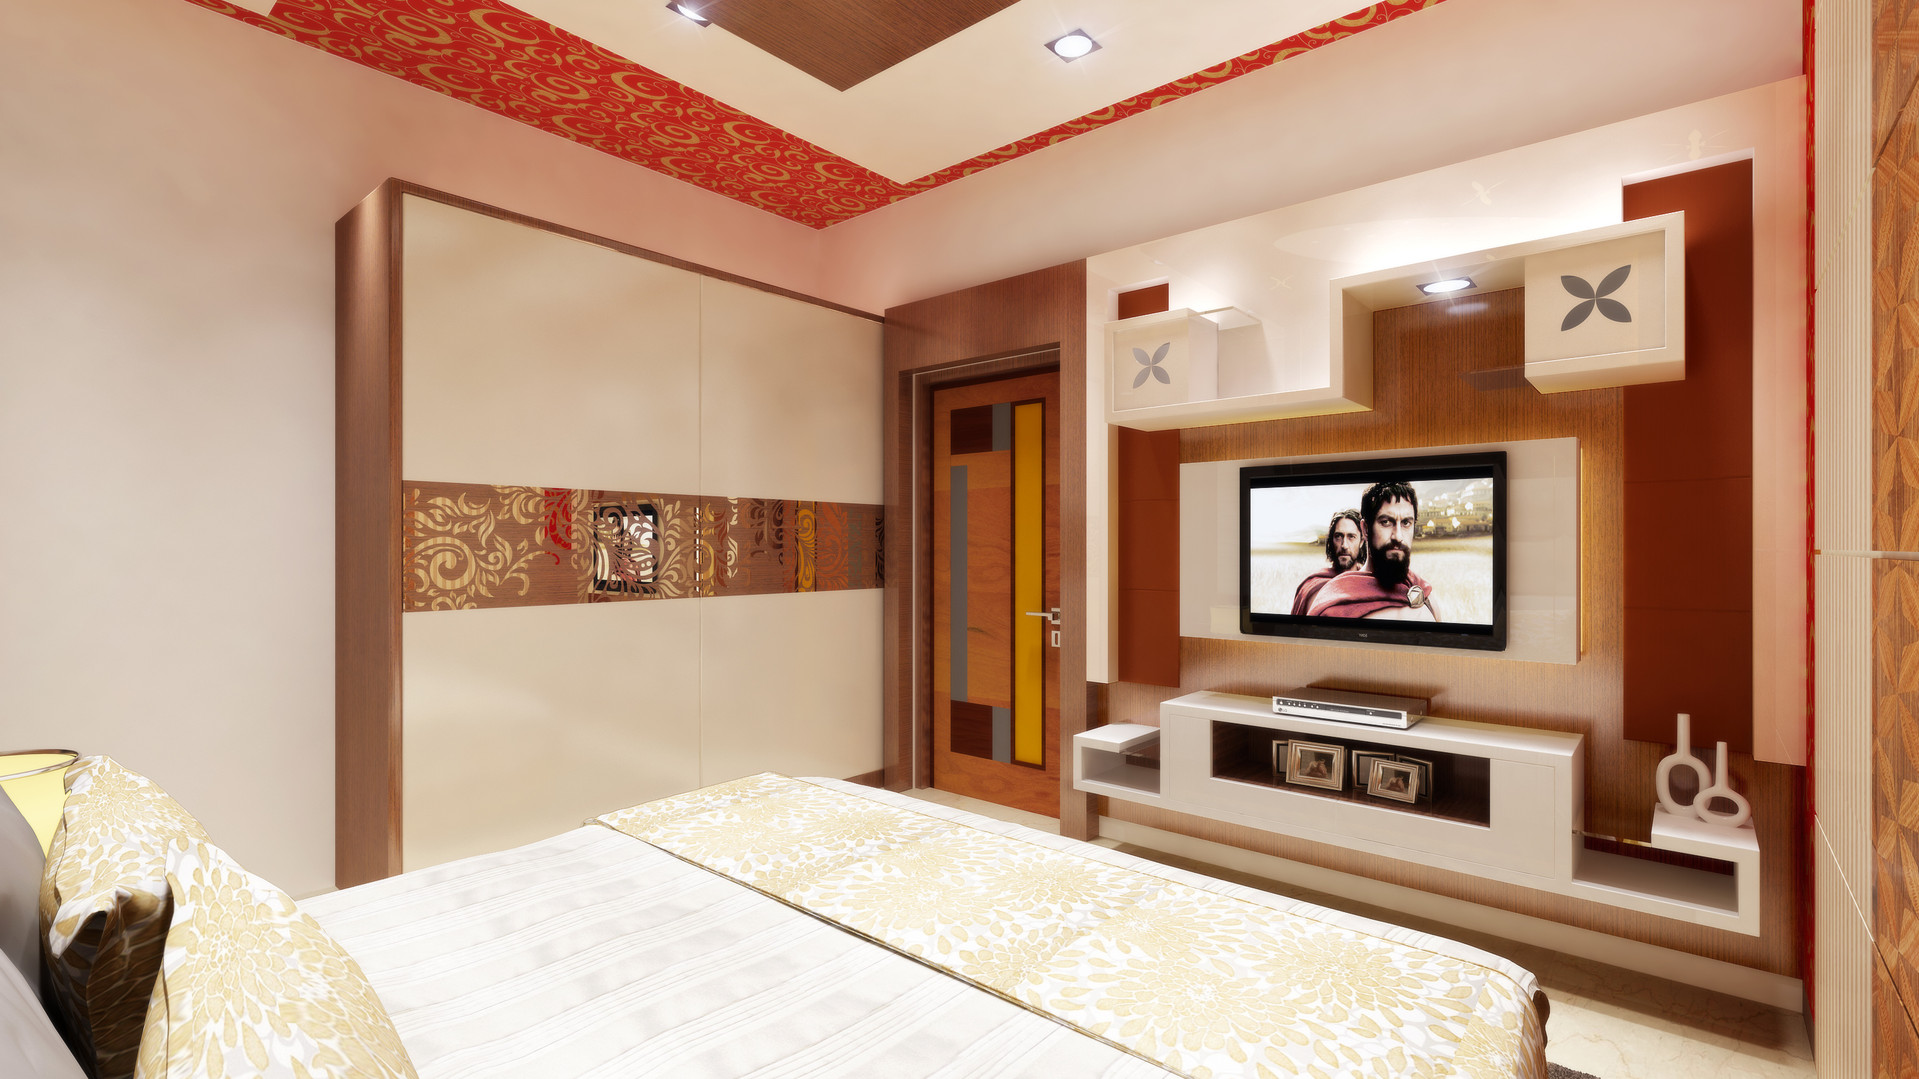 bedroom1.1.jpg